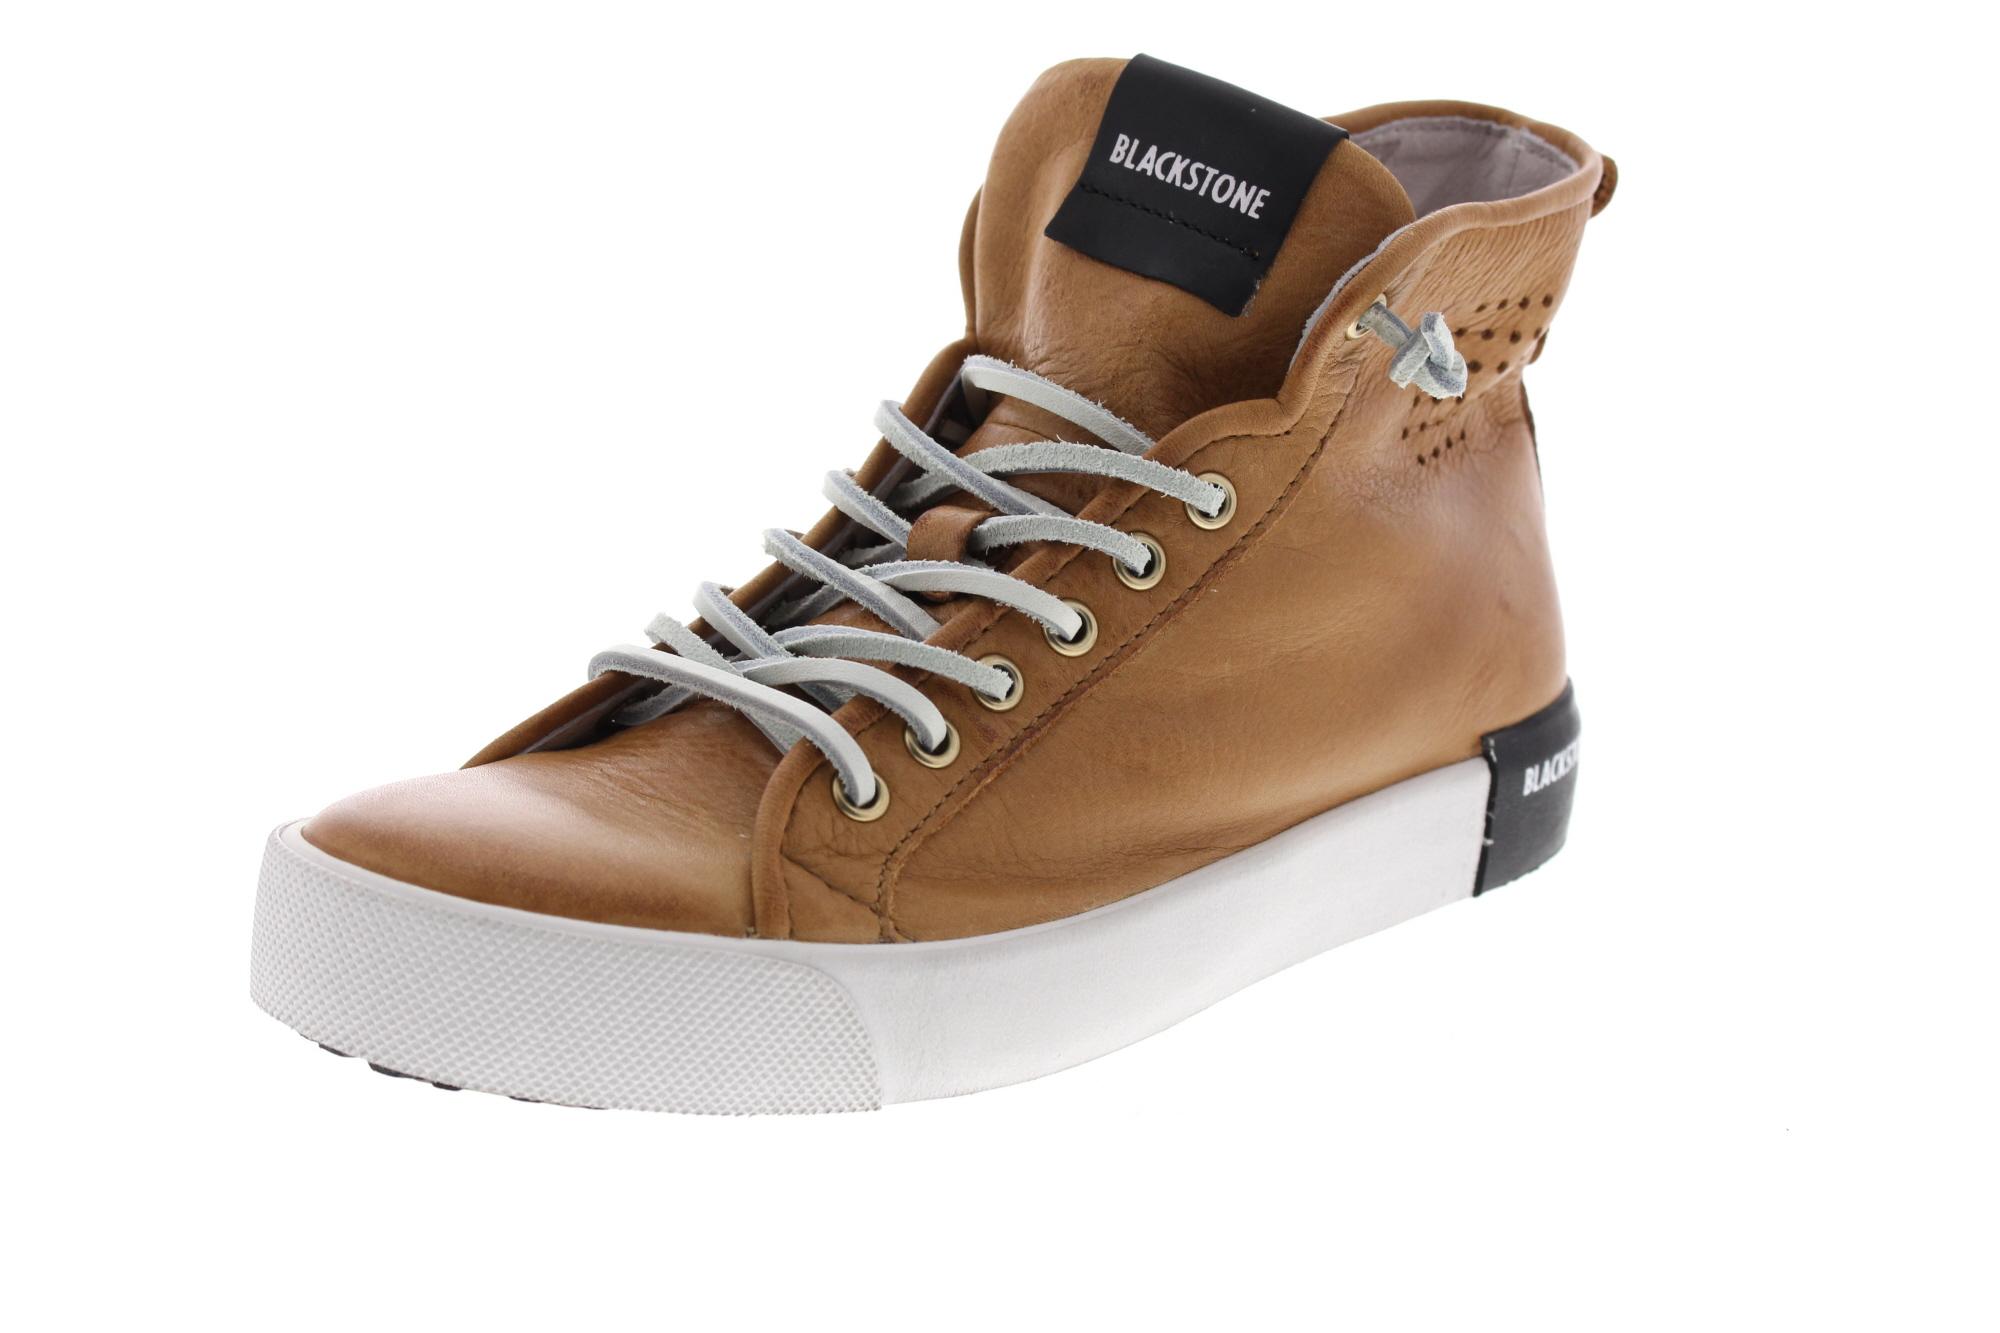 BLACKSTONE Damenschuhe - Hi-Cut-Sneakers PL70 - rust_0